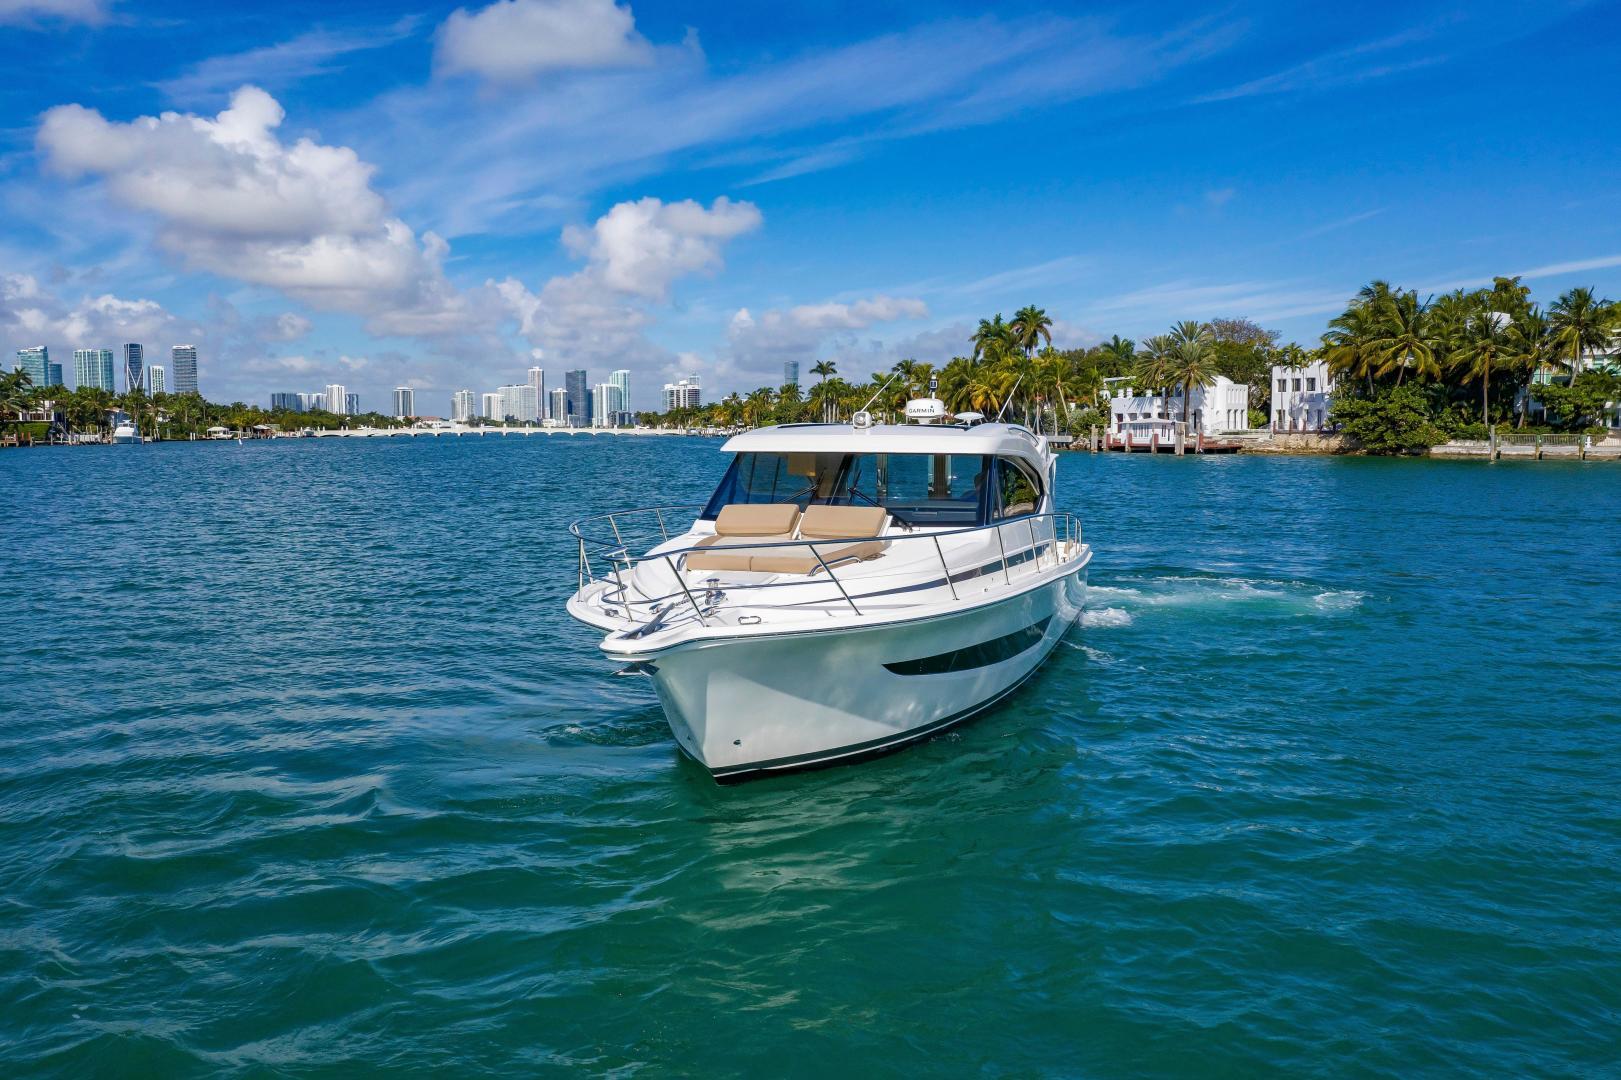 Riviera-395 SUV 2019-Ipanema Miami Beach-Florida-United States-1614866   Thumbnail